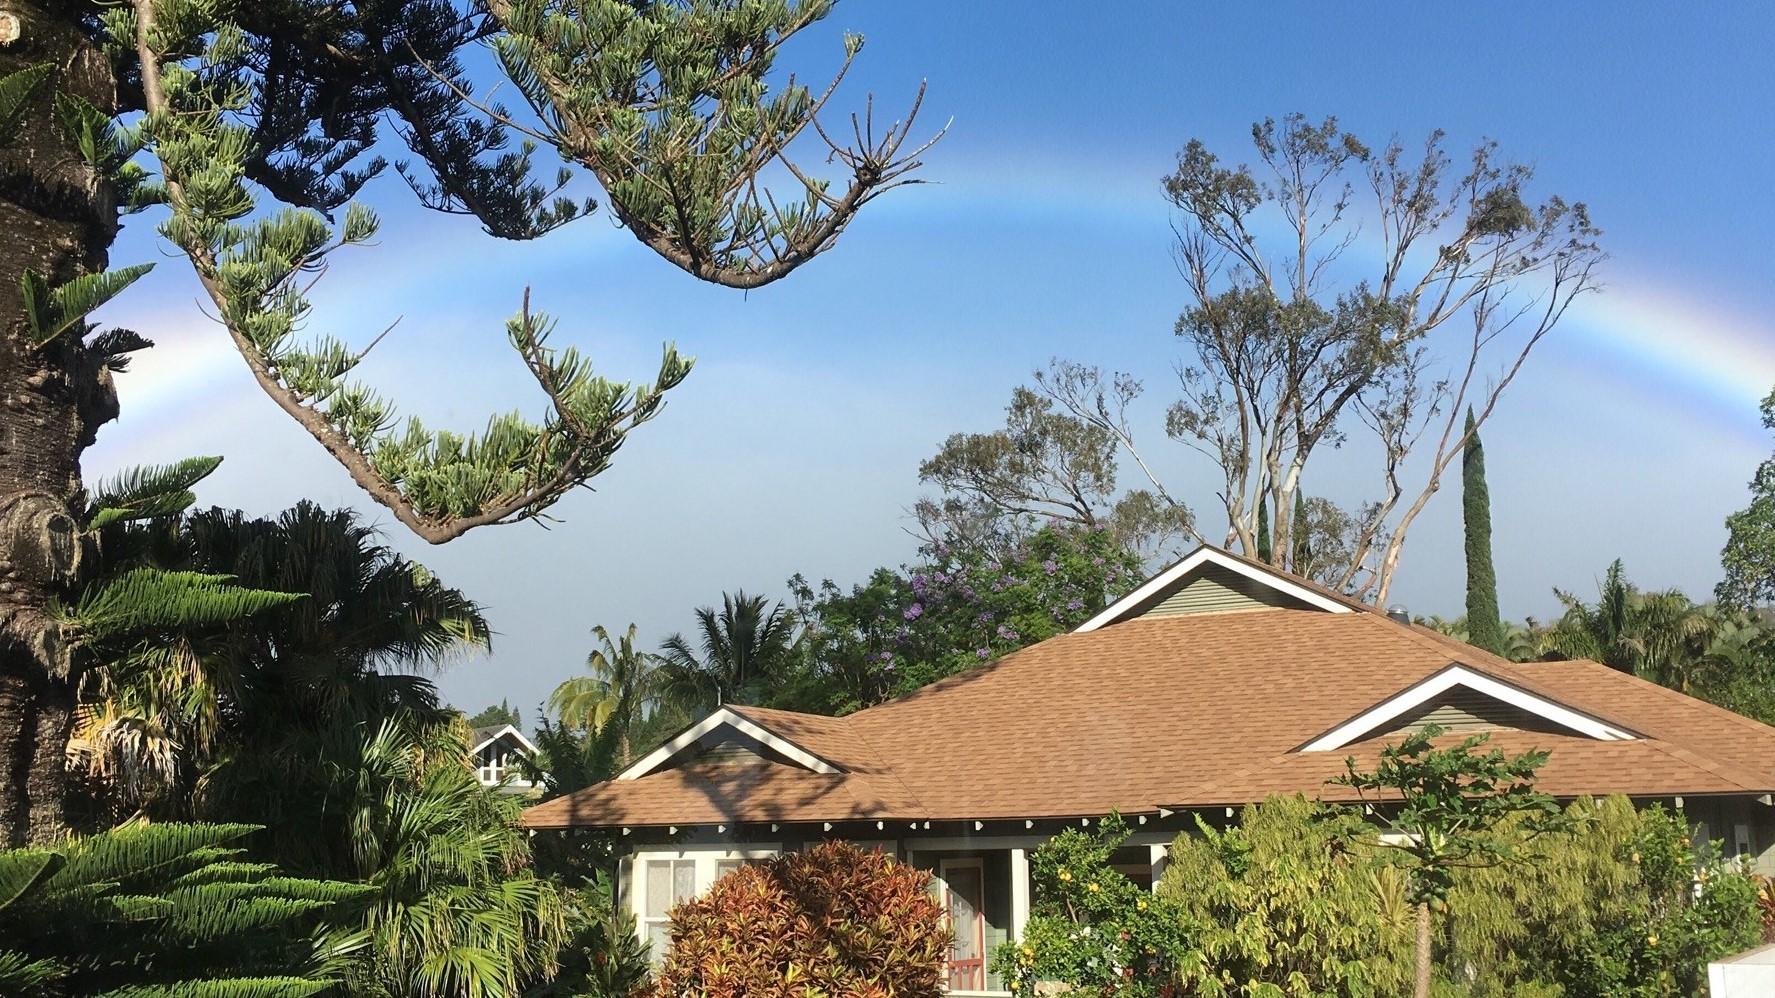 Makawao, Land of Rainbows and Blue Skies